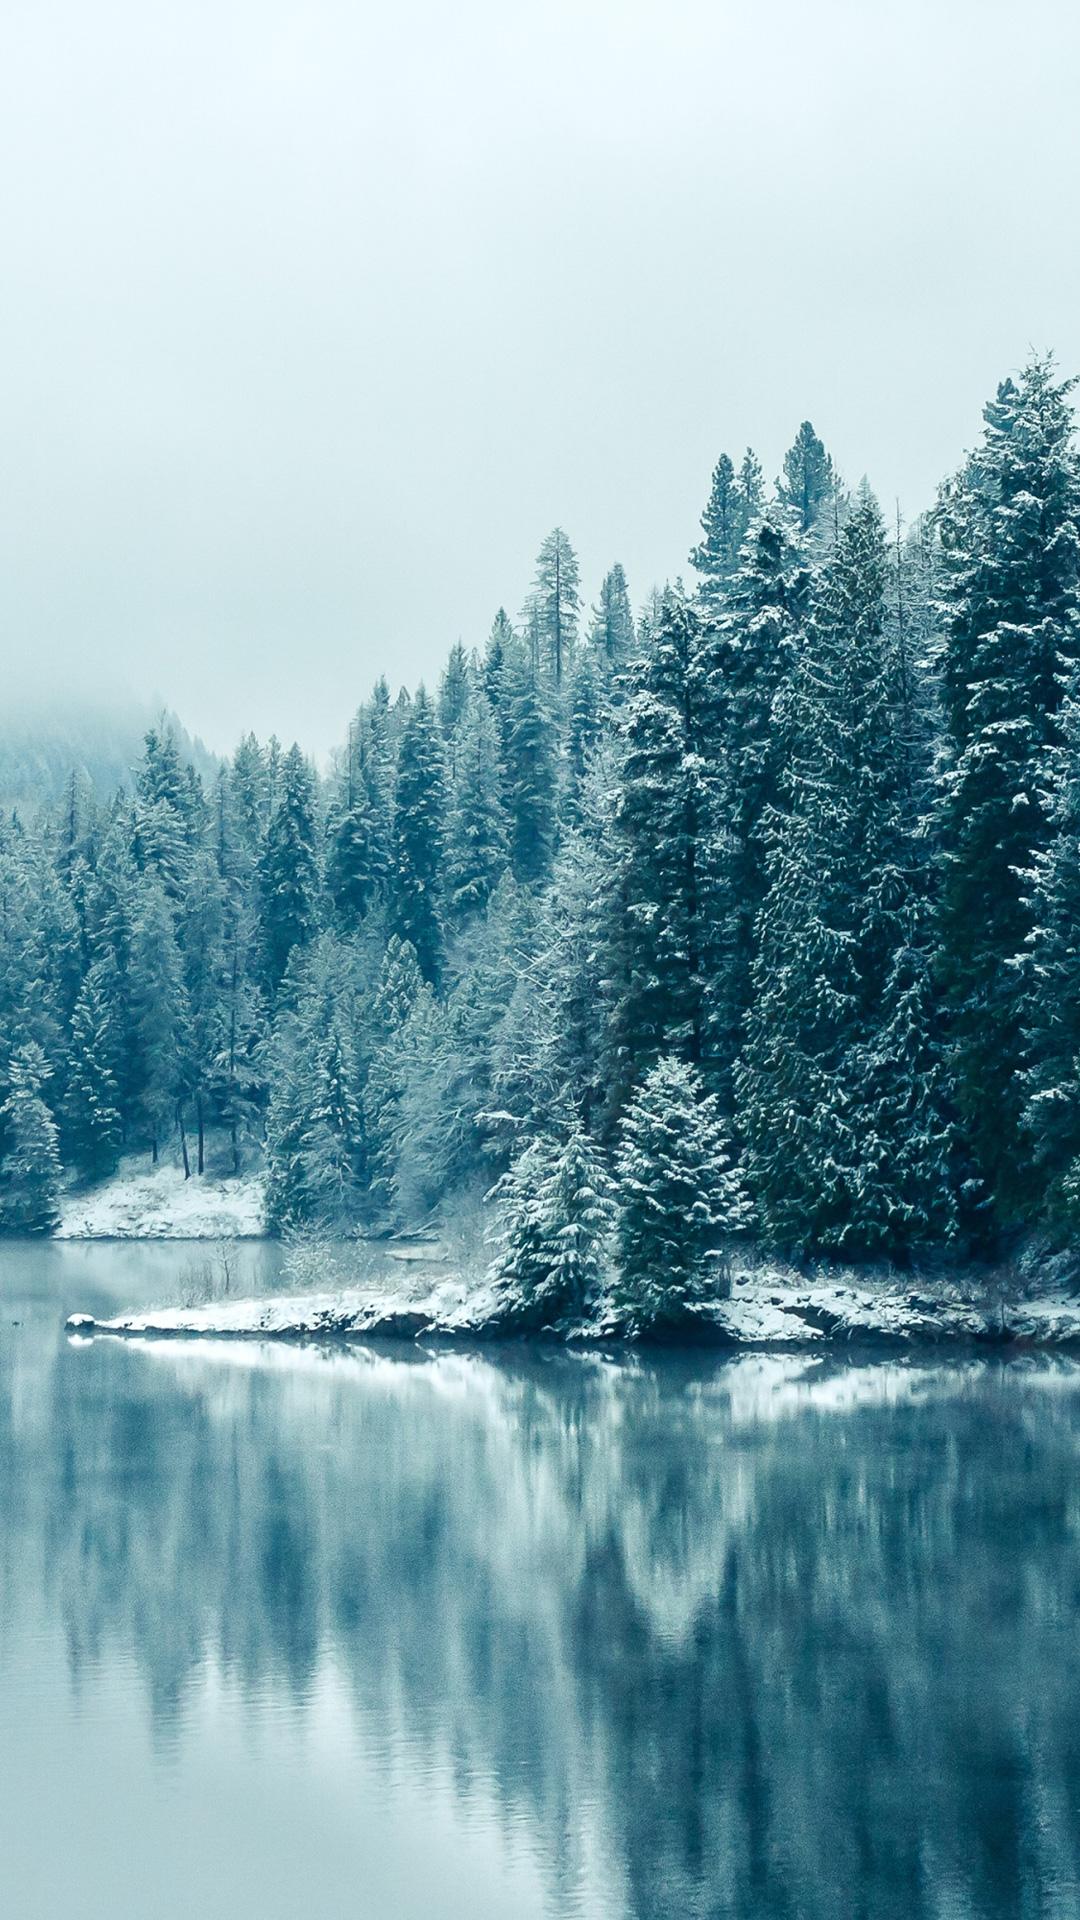 Winter Lake iPhone Wallpaper HD